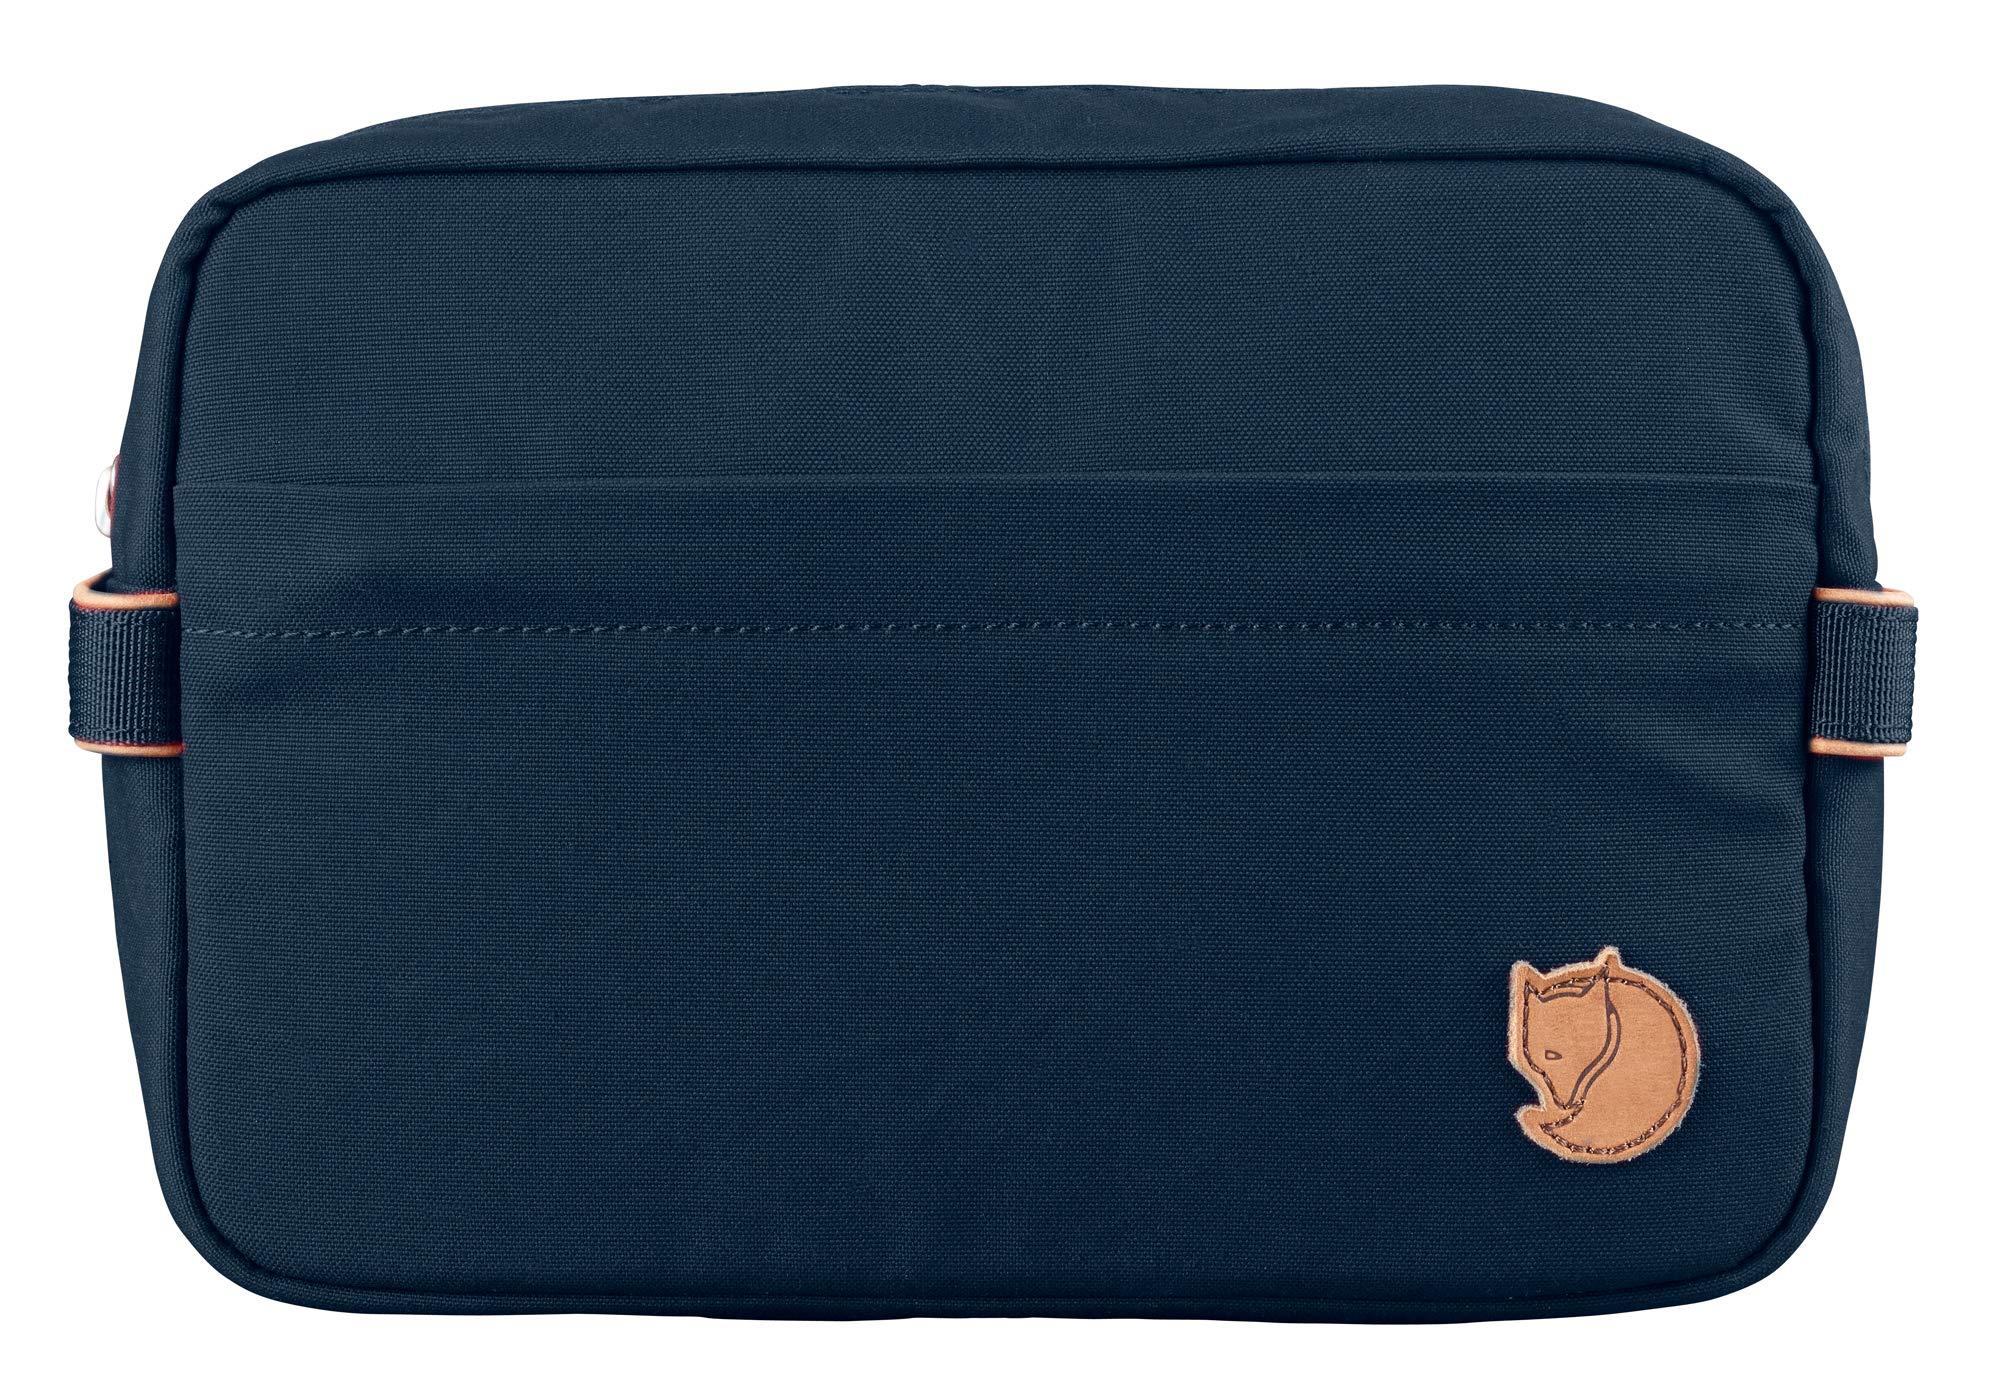 Fjallraven - Travel Toiletry Bag, Navy